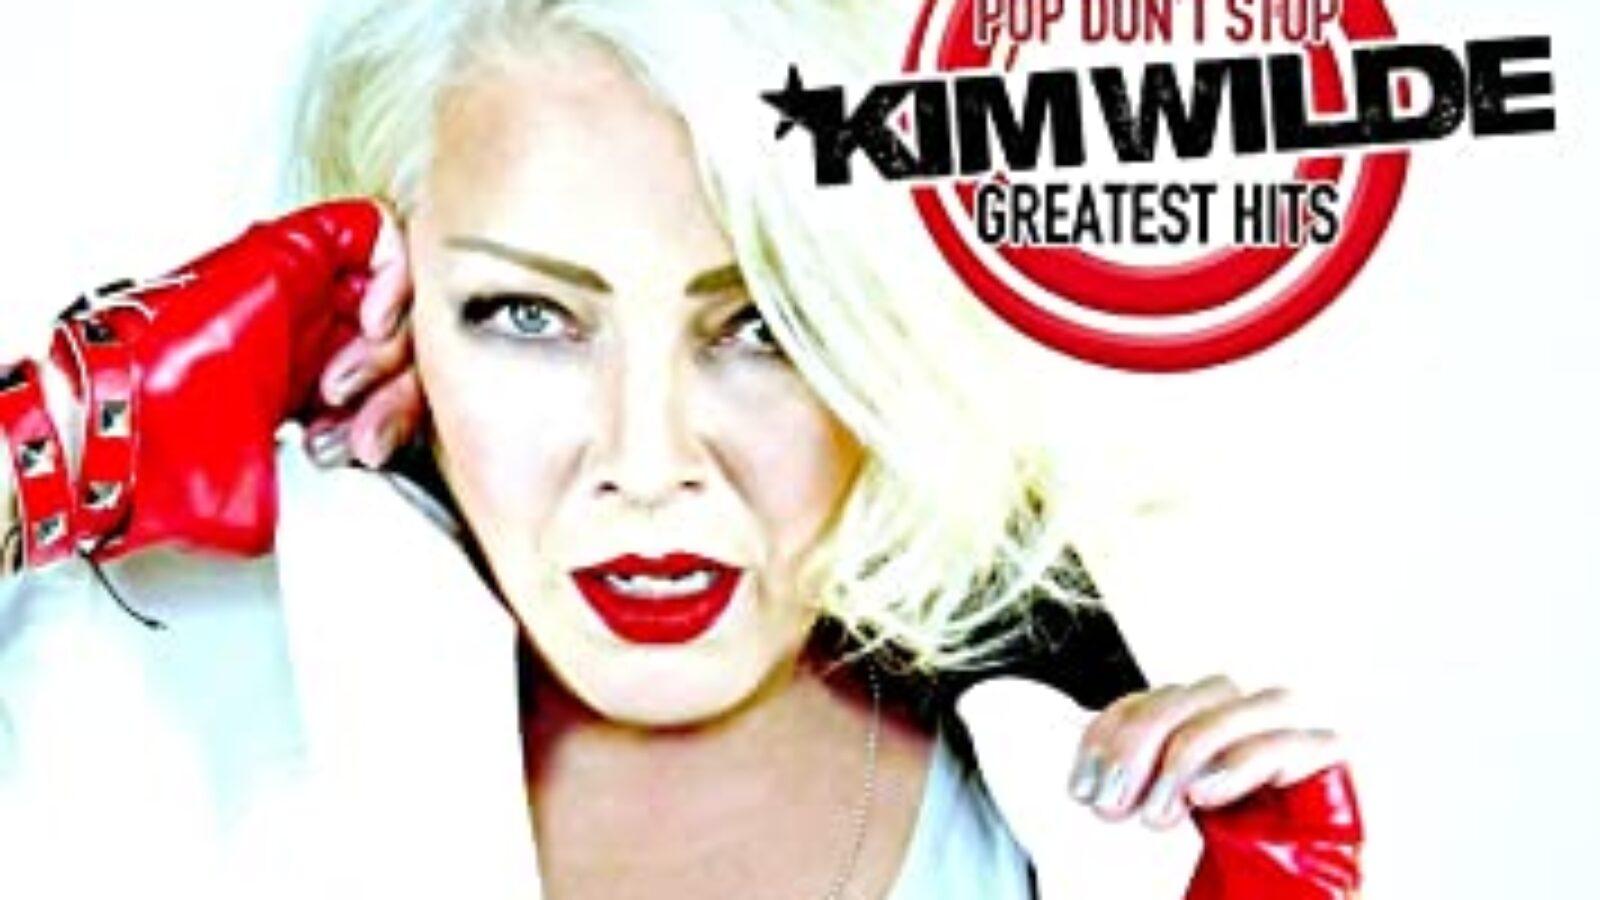 TOP 10 CD – PLATZ 2 – KIM WILDE